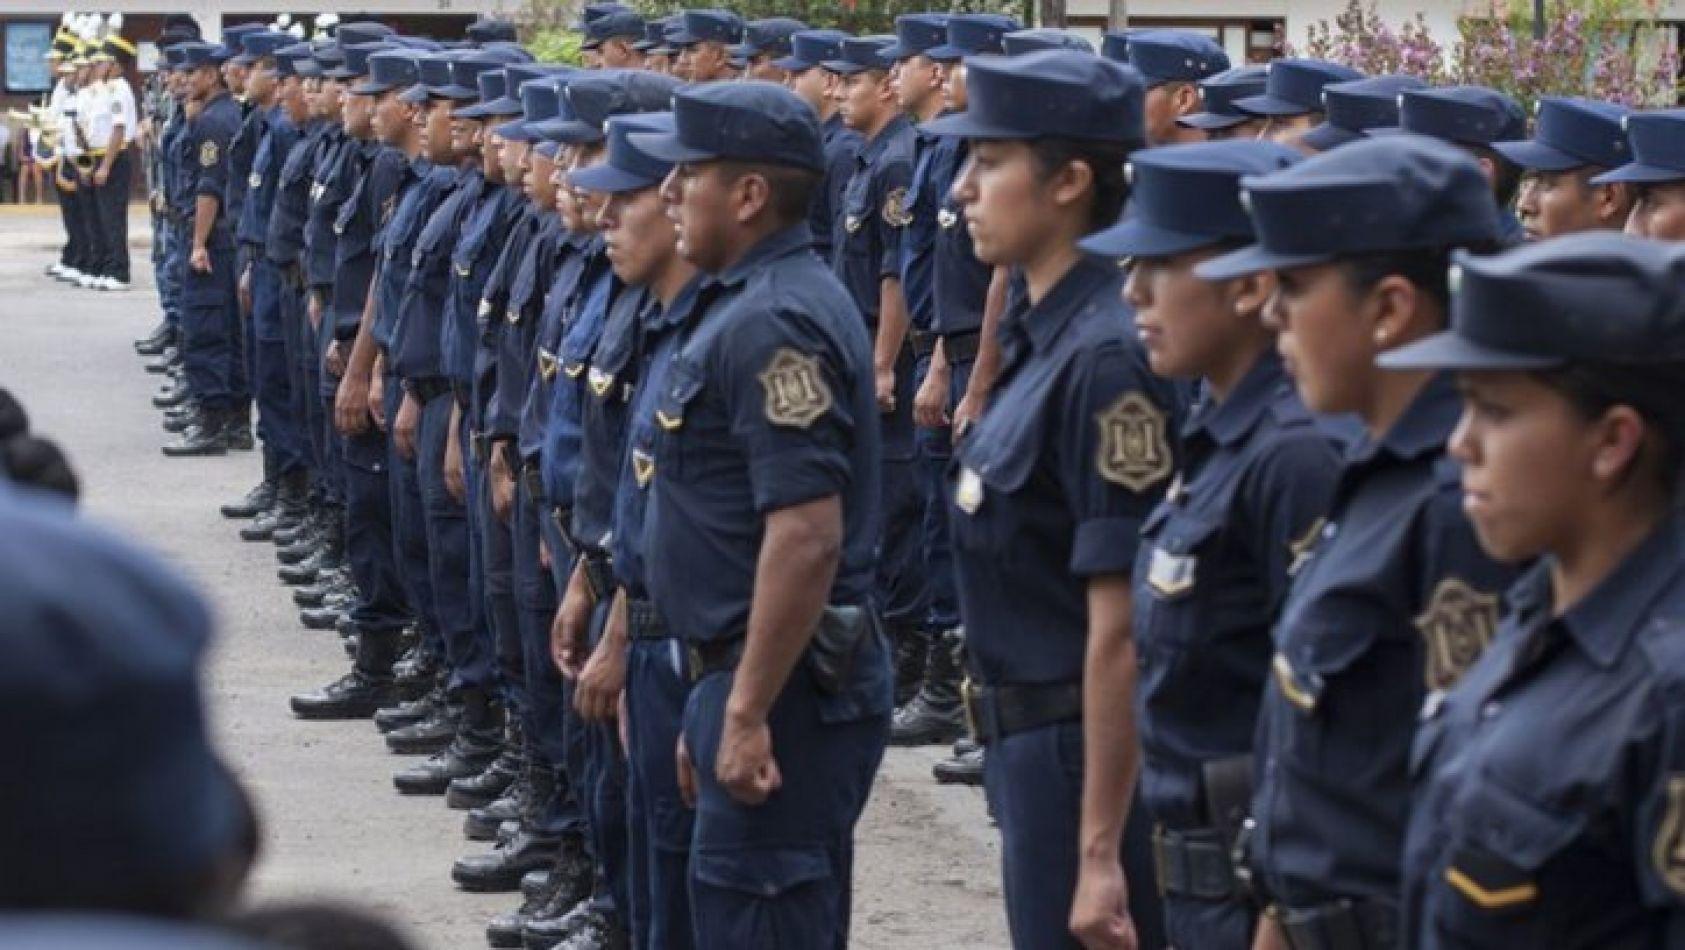 Piden juicio contra ocho policías por lesionar e intentar abusar sexualmente de un joven